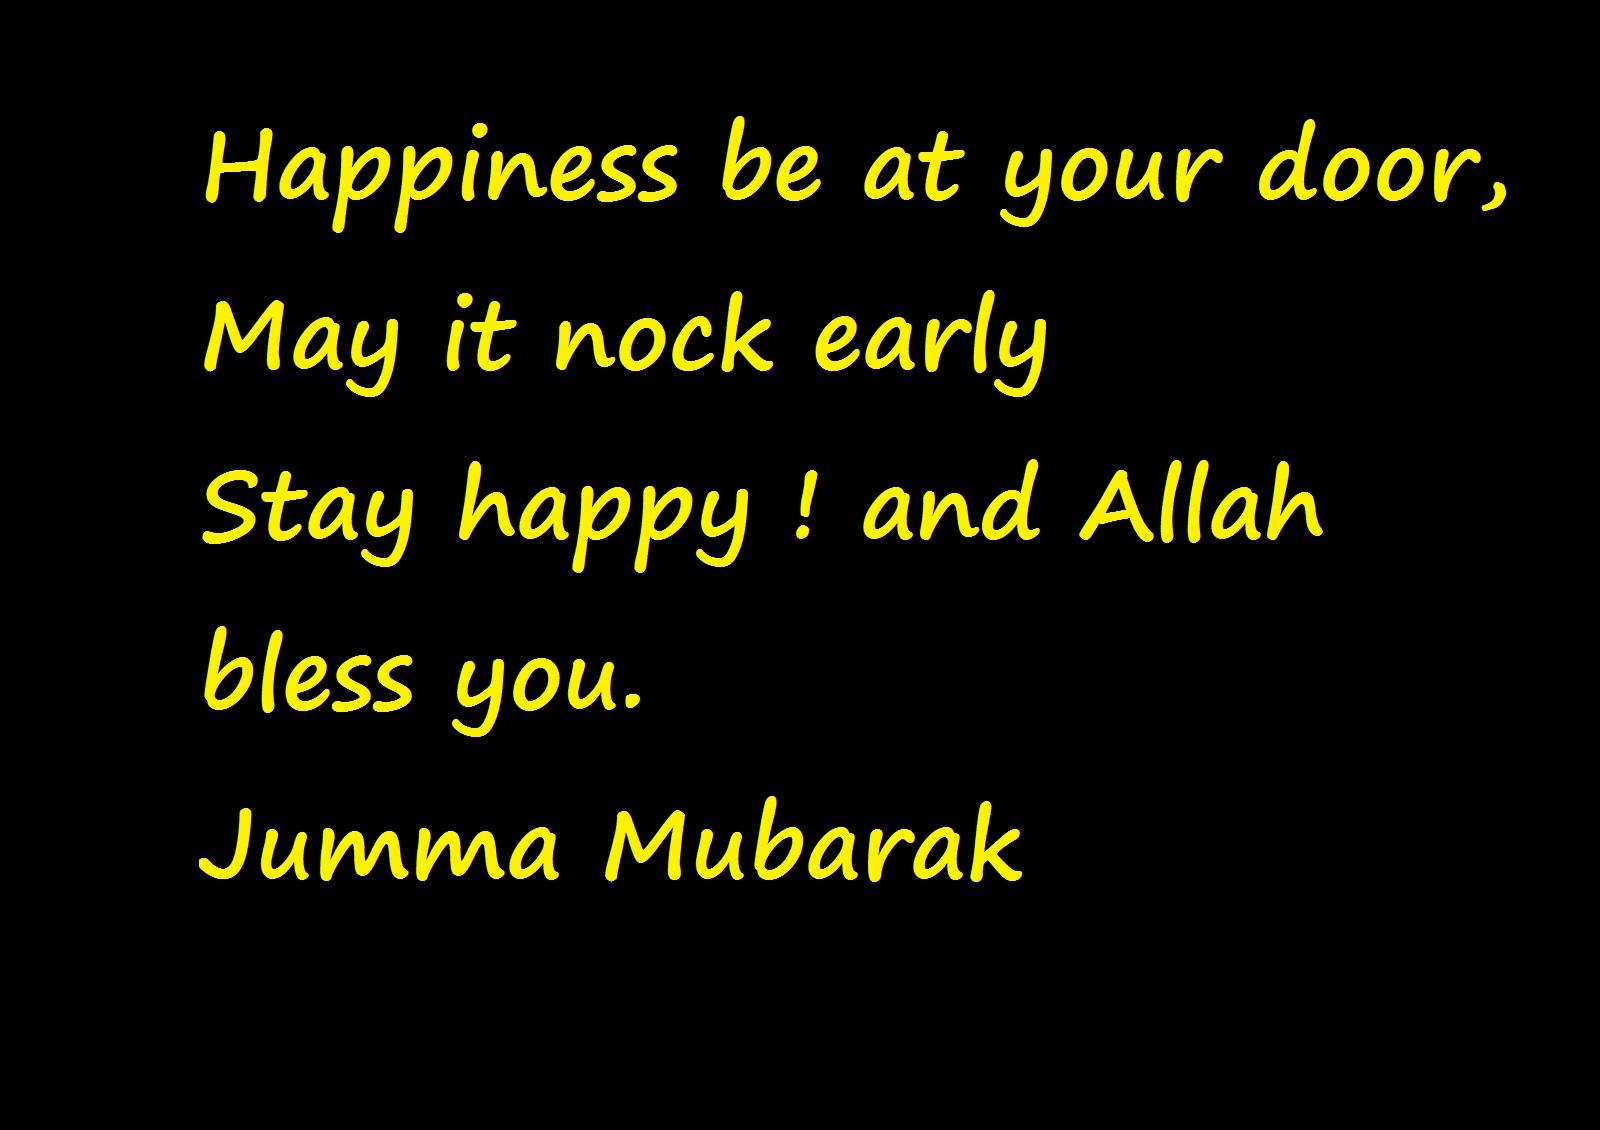 Jumma Mubarak Hadees Sms Wishes And Prayers Skardu